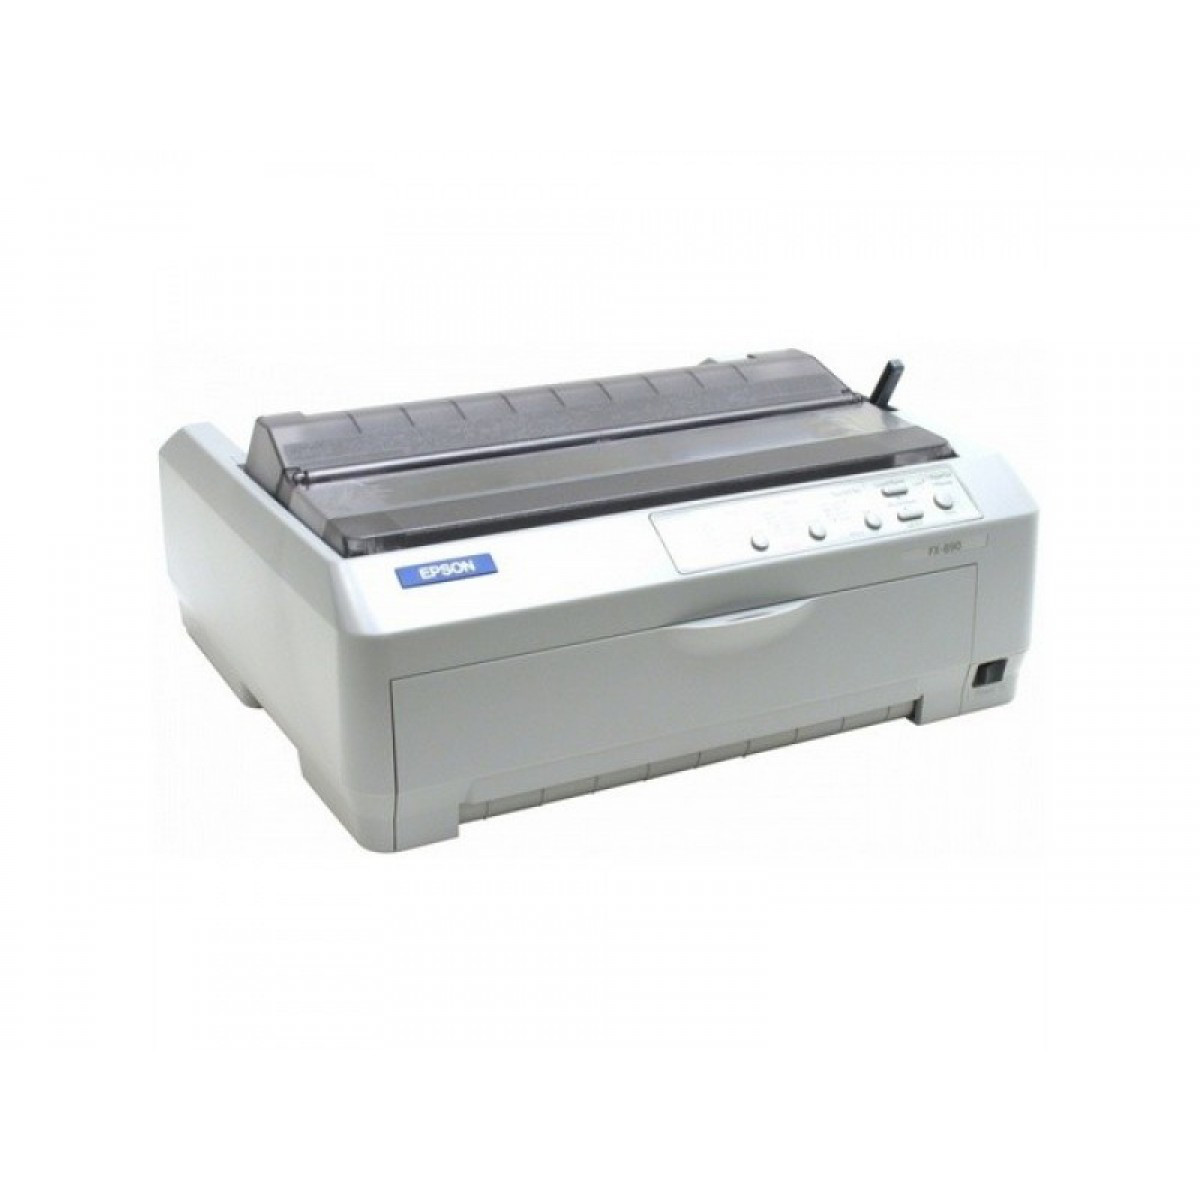 Матричный принтер EPSON FX890